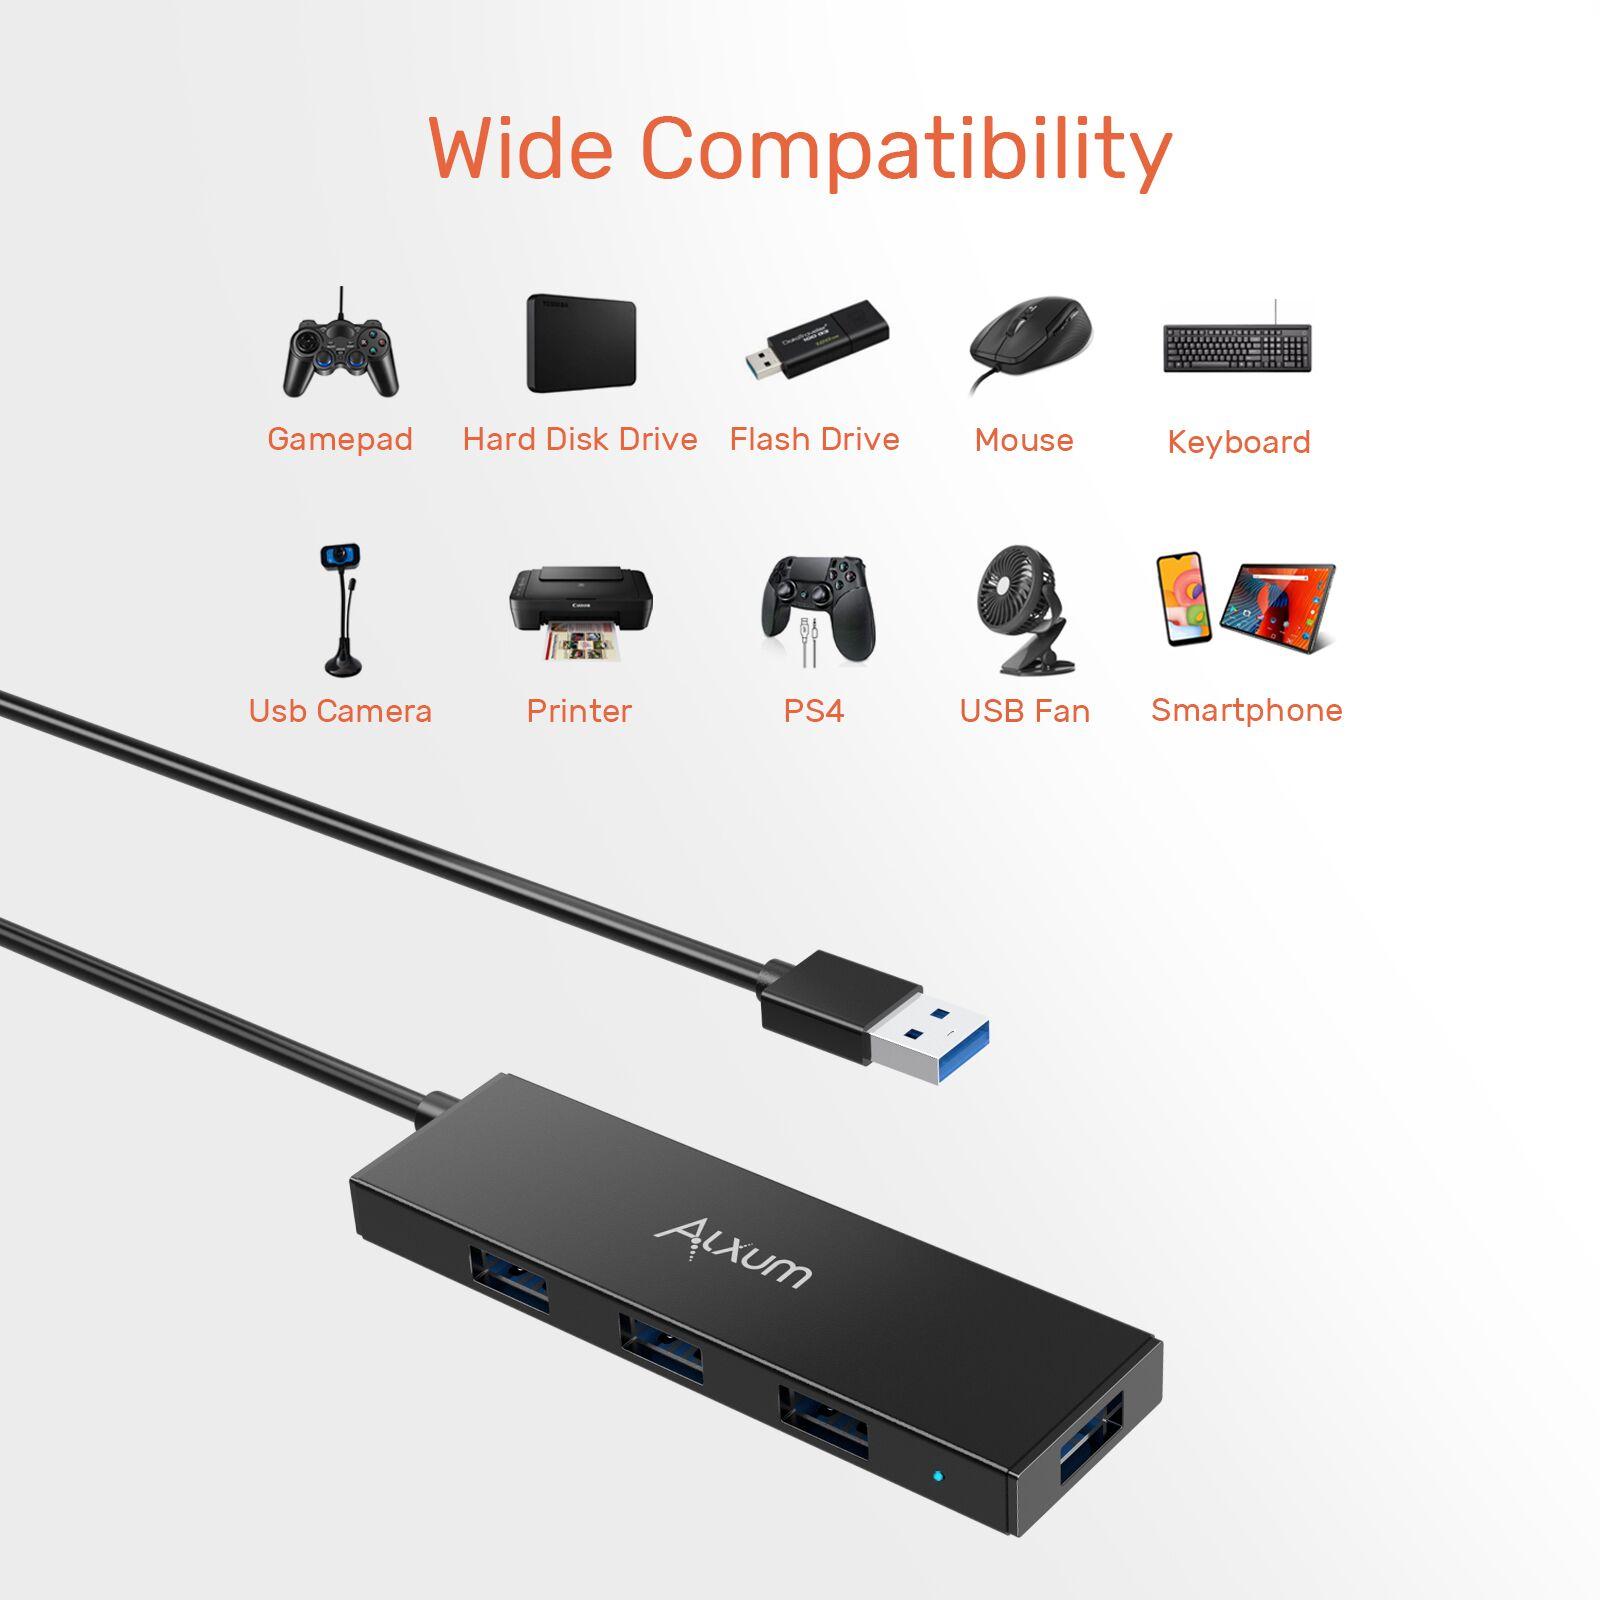 $8.77 Alxum USB 3.0 Extension Hub 4-Port, USB Hub Long Cord 4ft with MicroB Power Port, USB Data Hub for Desktop PC, MacBook, Mac Mini, iMac Pro, microsoft - $8.77